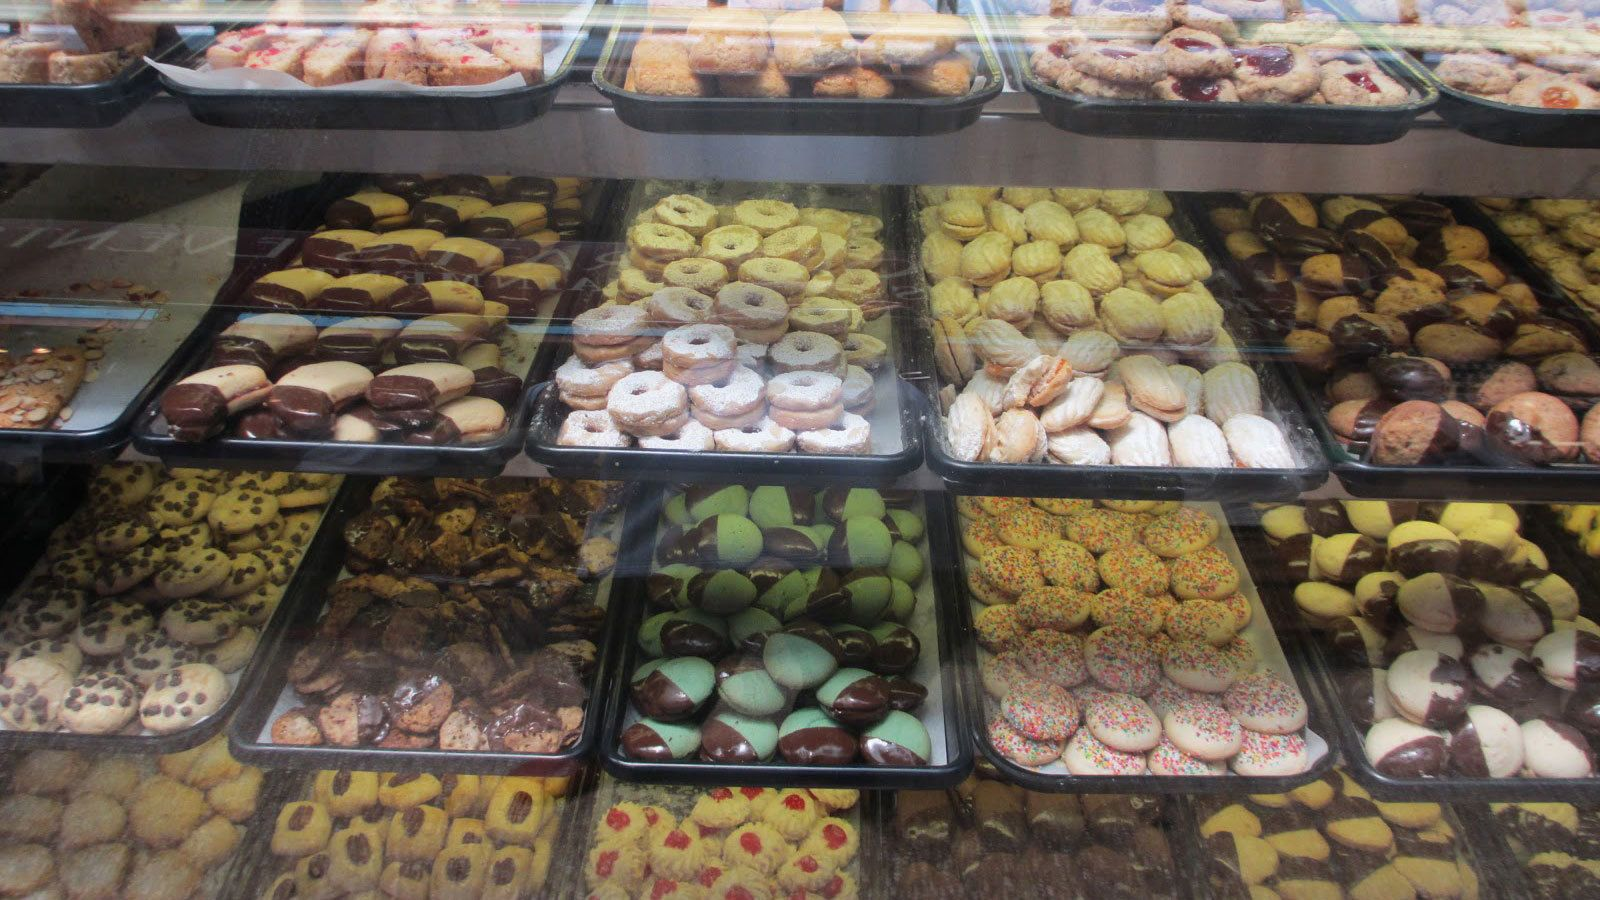 Display of Italian pastries in New York